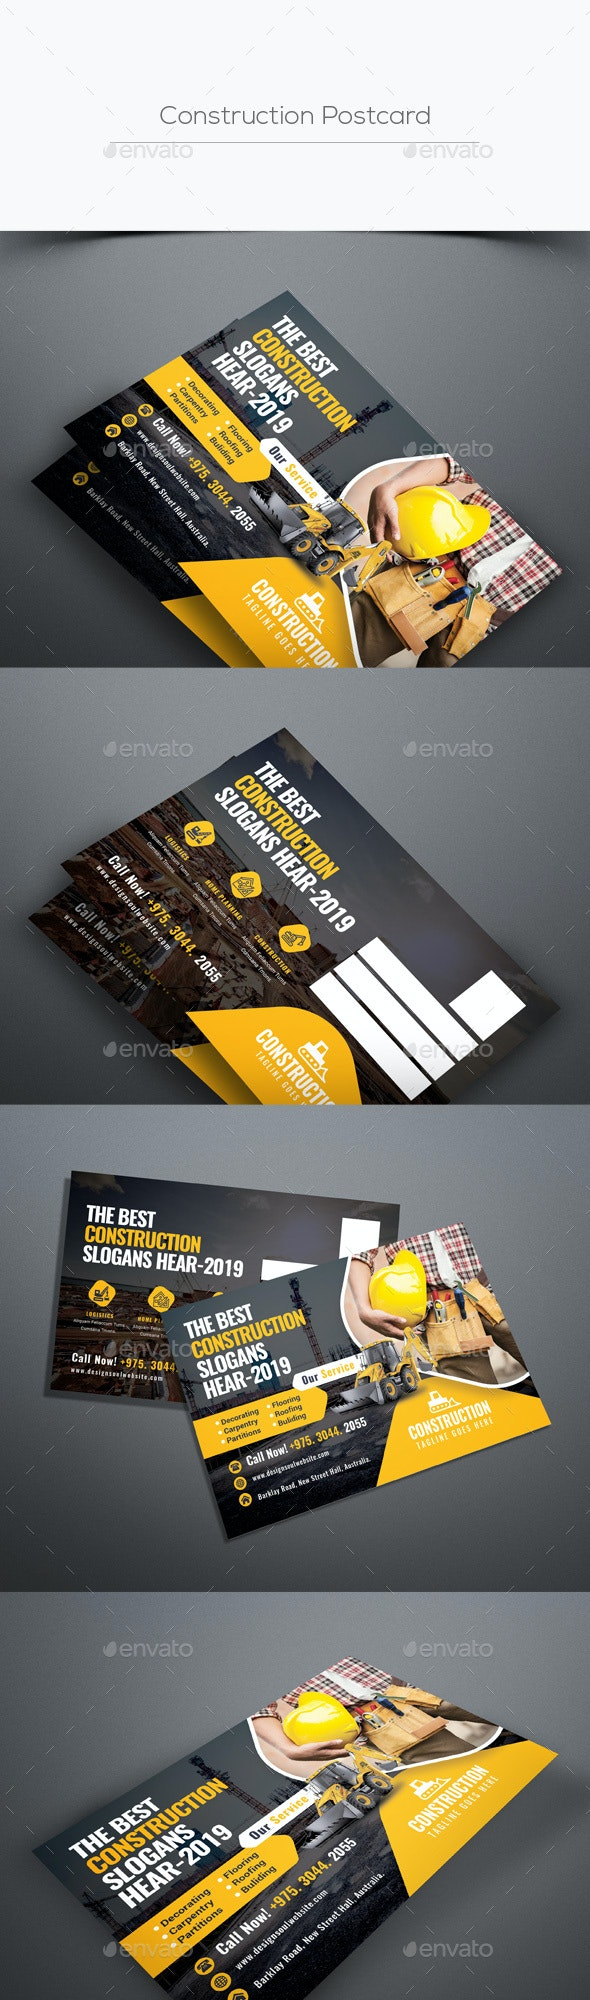 Construction Postcard - Cards & Invites Print Templates